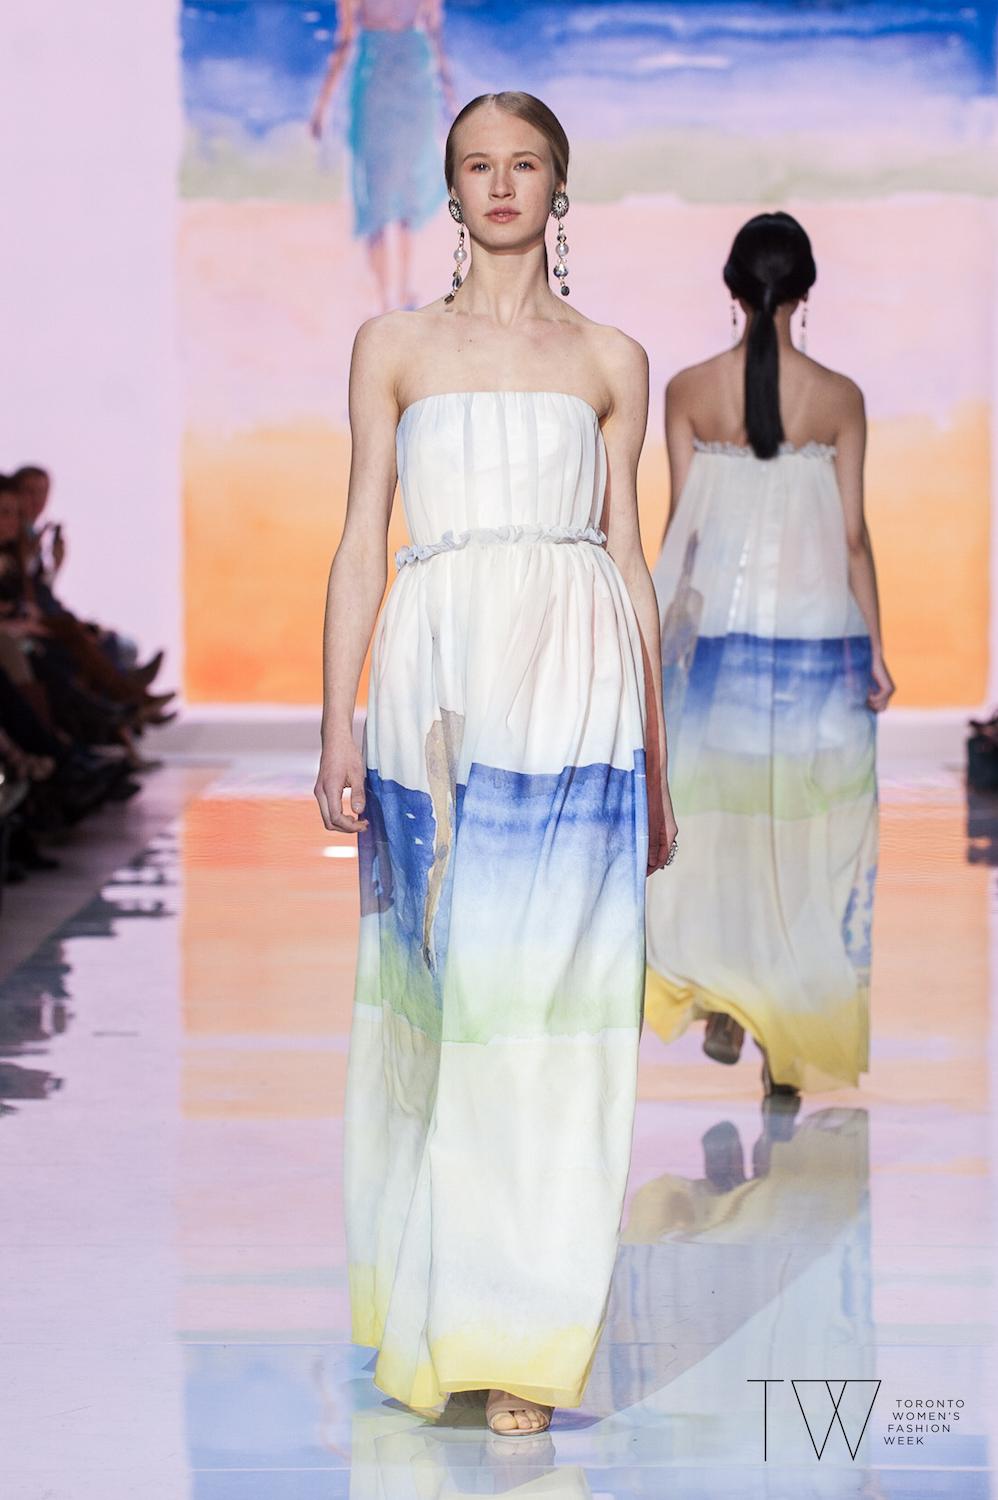 7c100-david-dixon-dr-john-semple-tw-toronto-womens-fashion-week-photo-credit-che-rosales-watercolour-look-3.jpg